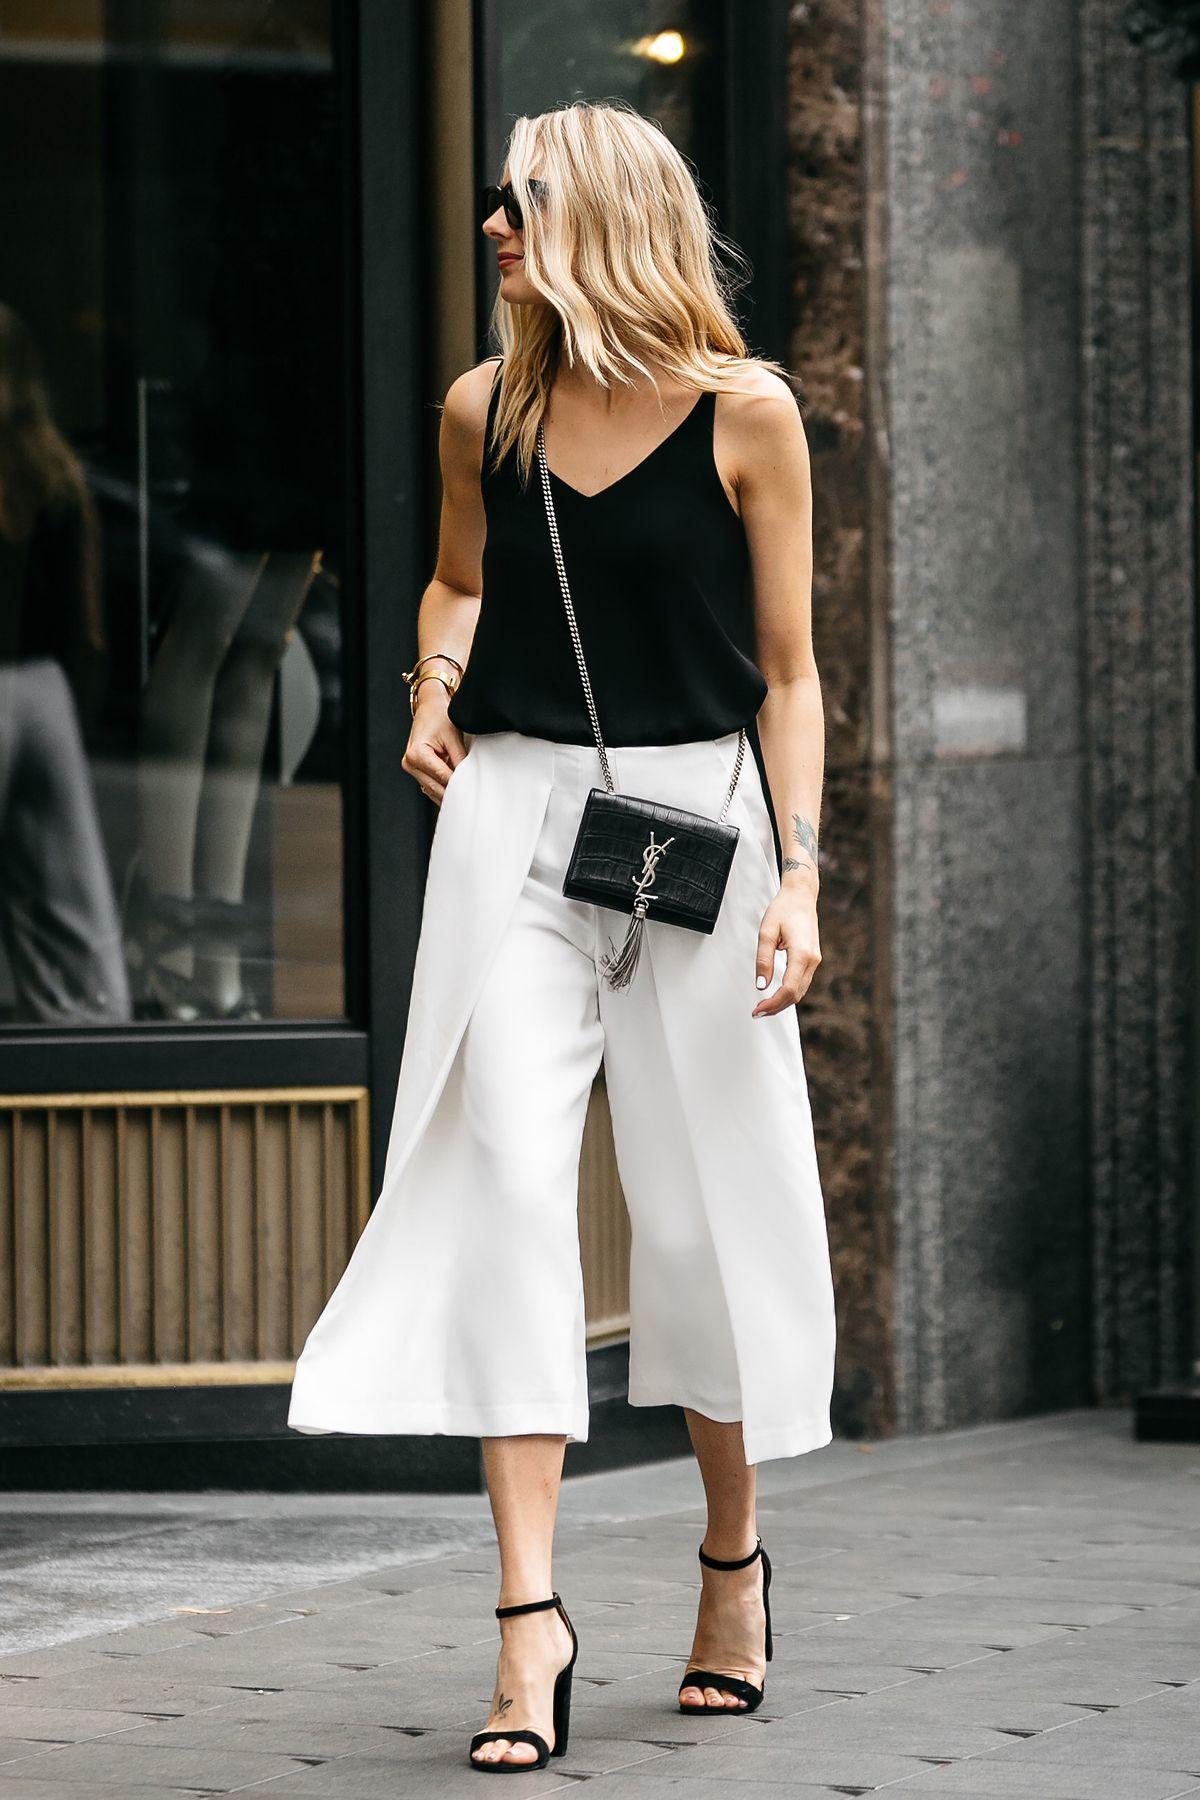 42b9abc8f7e2 Fashion Jackson, Dallas Blogger, Fashion Blogger, Street Style, Topshop  Black Cami Tanktop, White Culottes, Saint Laurent Monogram Cassandre  Crossbody ...